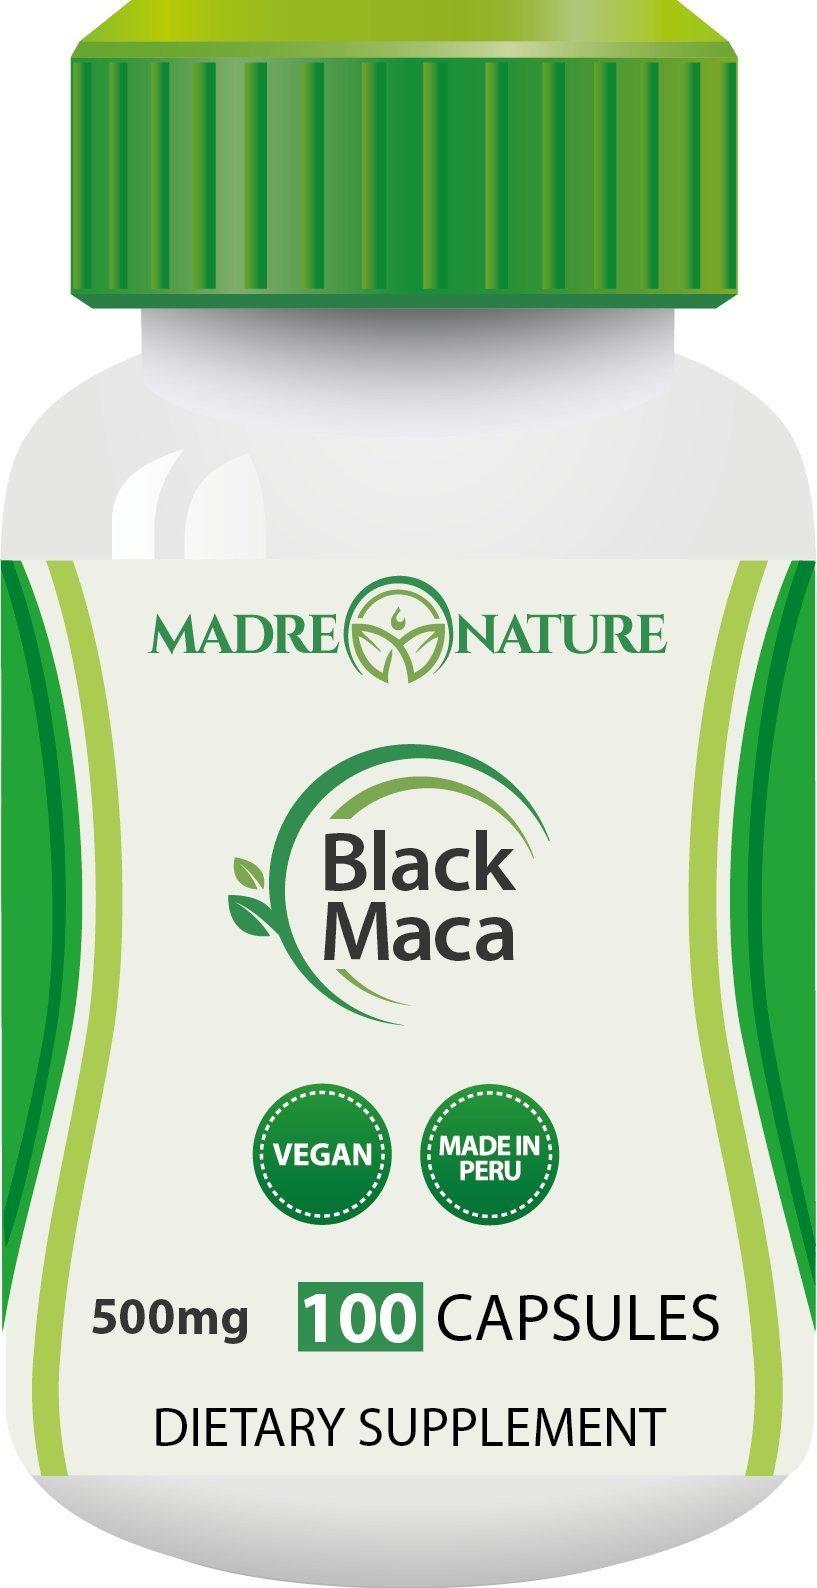 Madre Nature - Organic Gelatinized Black Maca Root Supplement from Peru - 500mg X 100 Capules (Vegan) - Peruvian Andes - Gluten-free